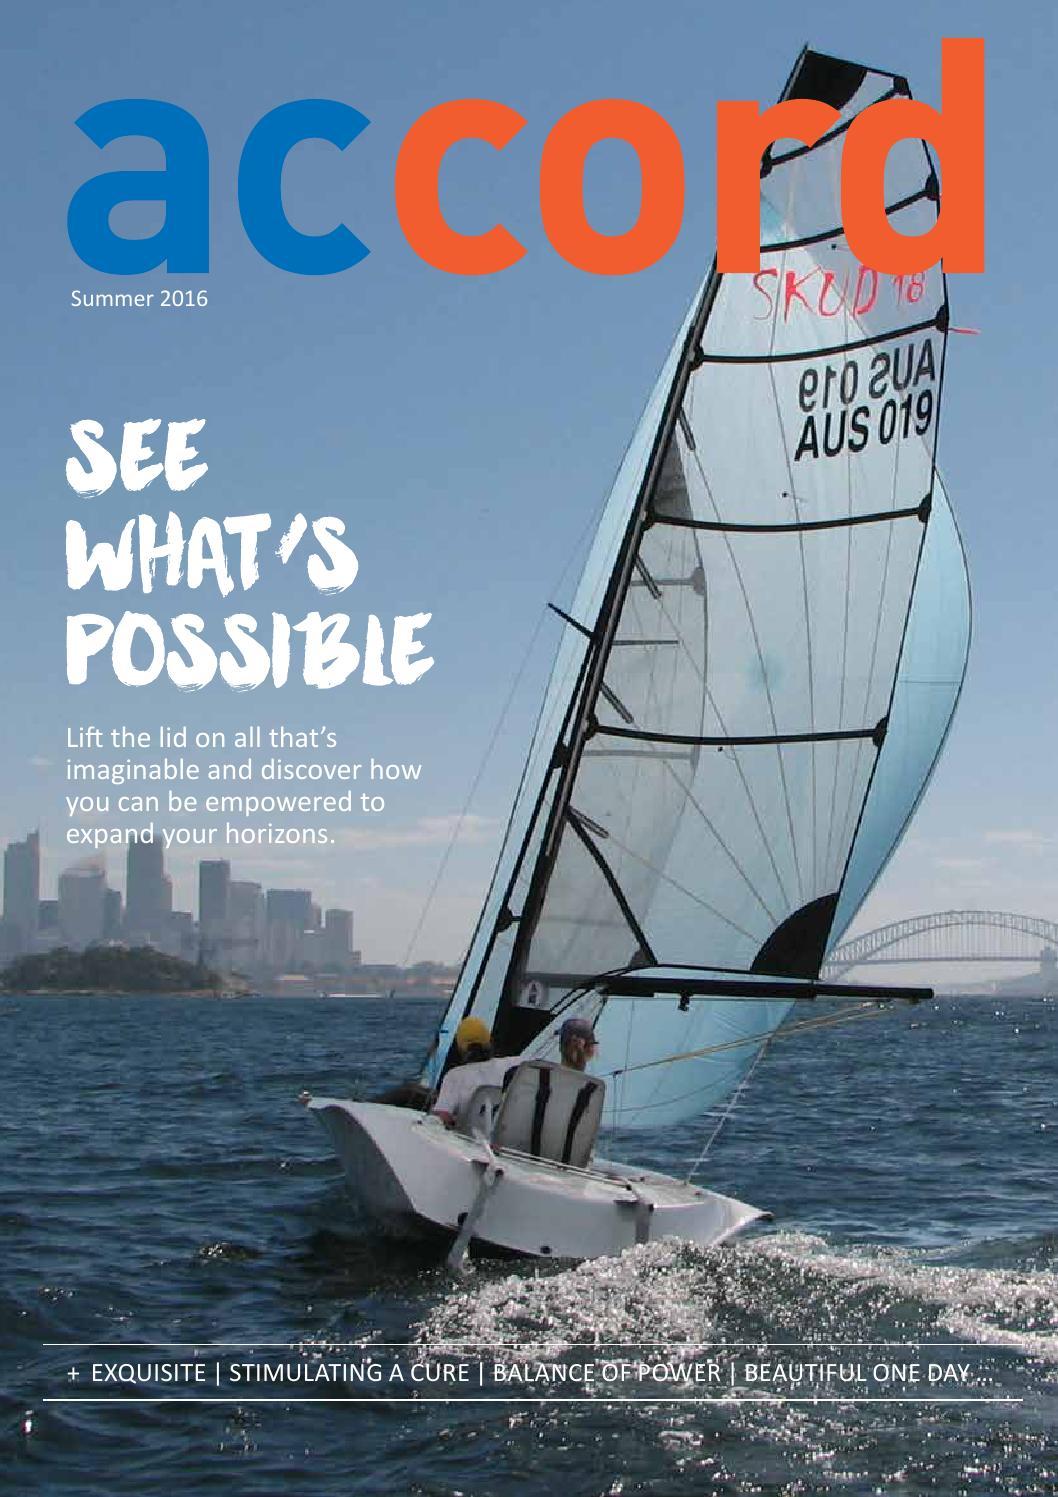 Accord Summer 2016 By Spinal Cord Injuries Australia Issuu Holder Handle Under Raiser Bawah Beat Street